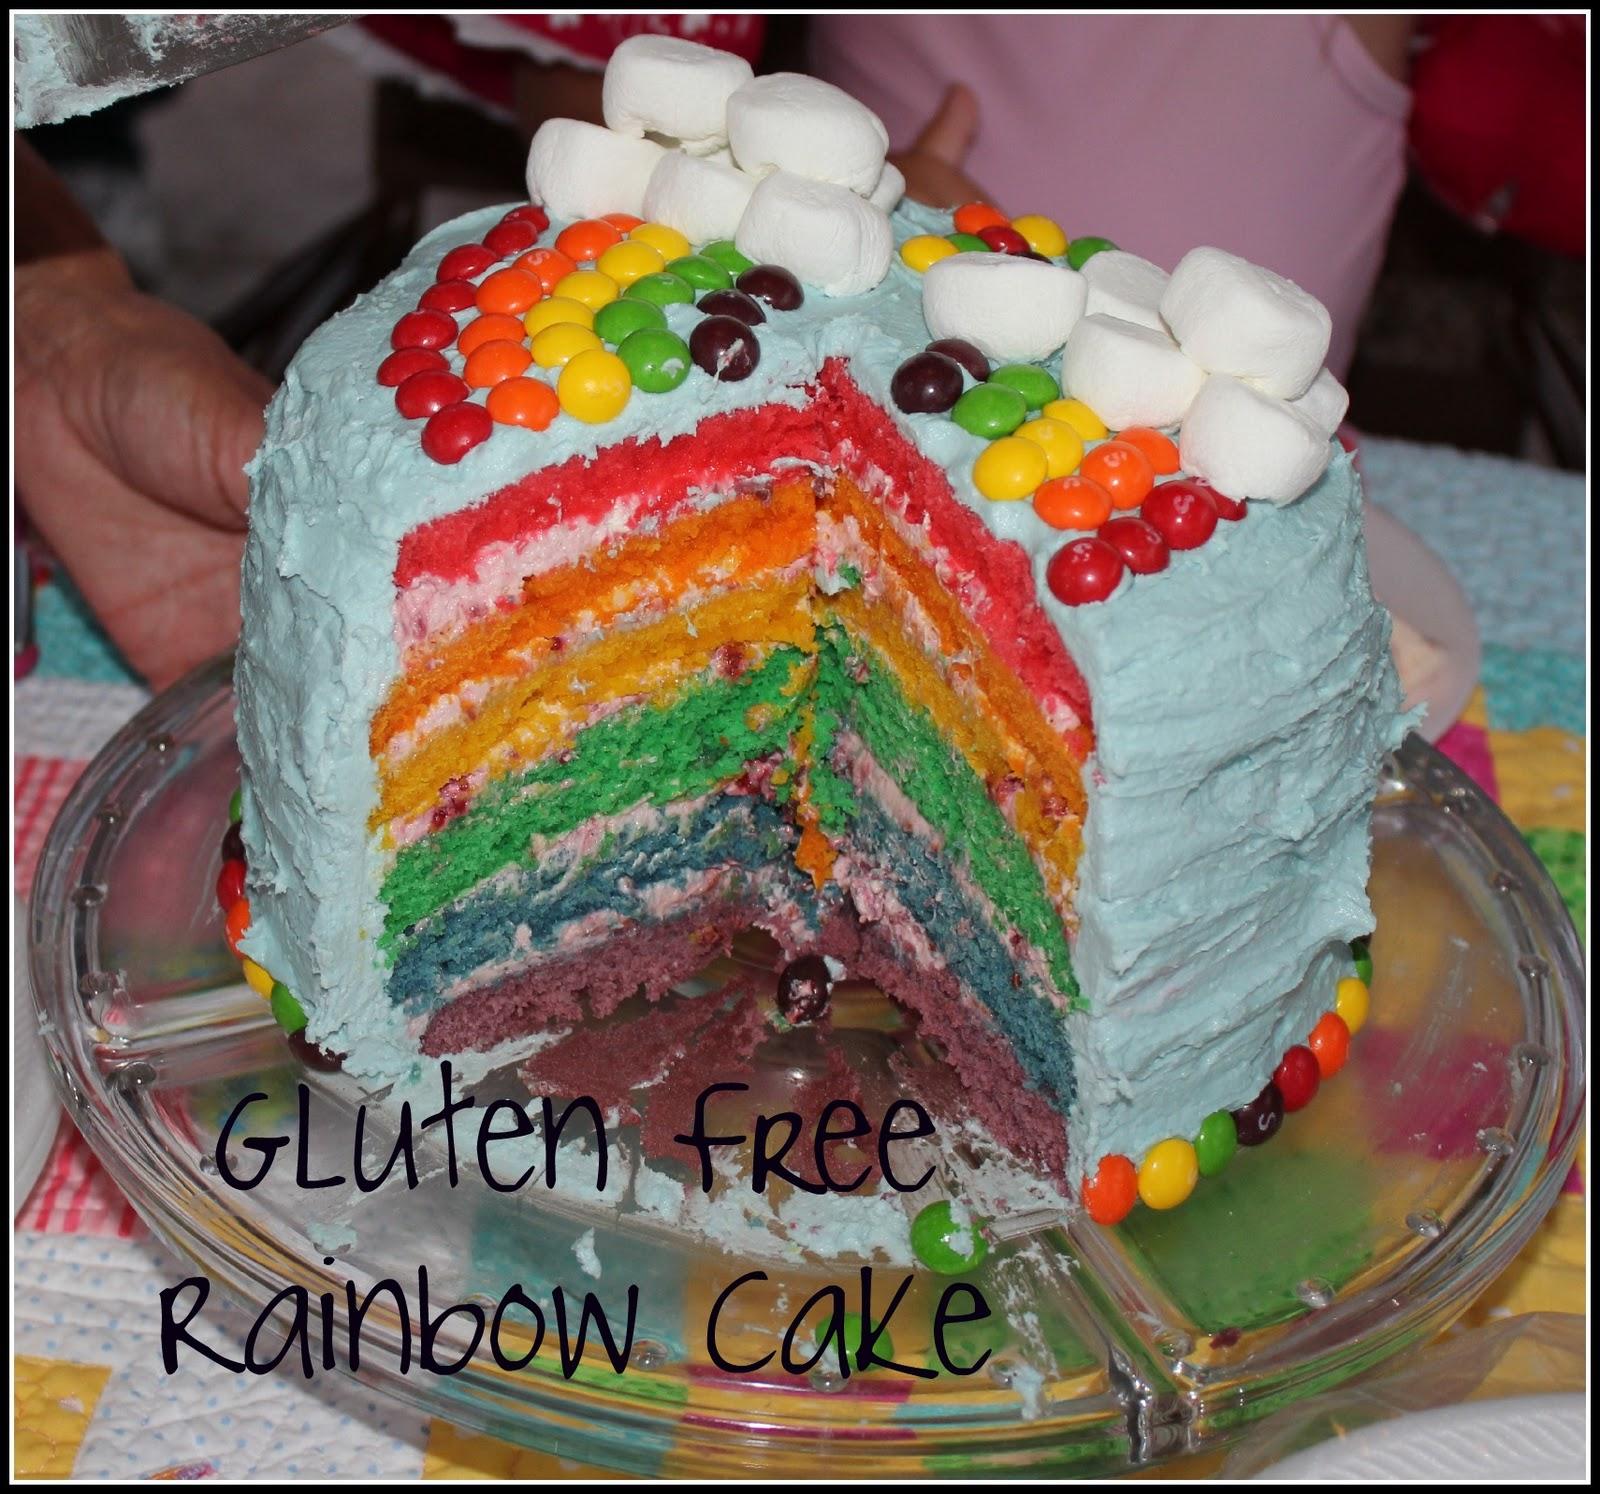 Taming of the celiac Sprue Gluten Free Rainbow Cake